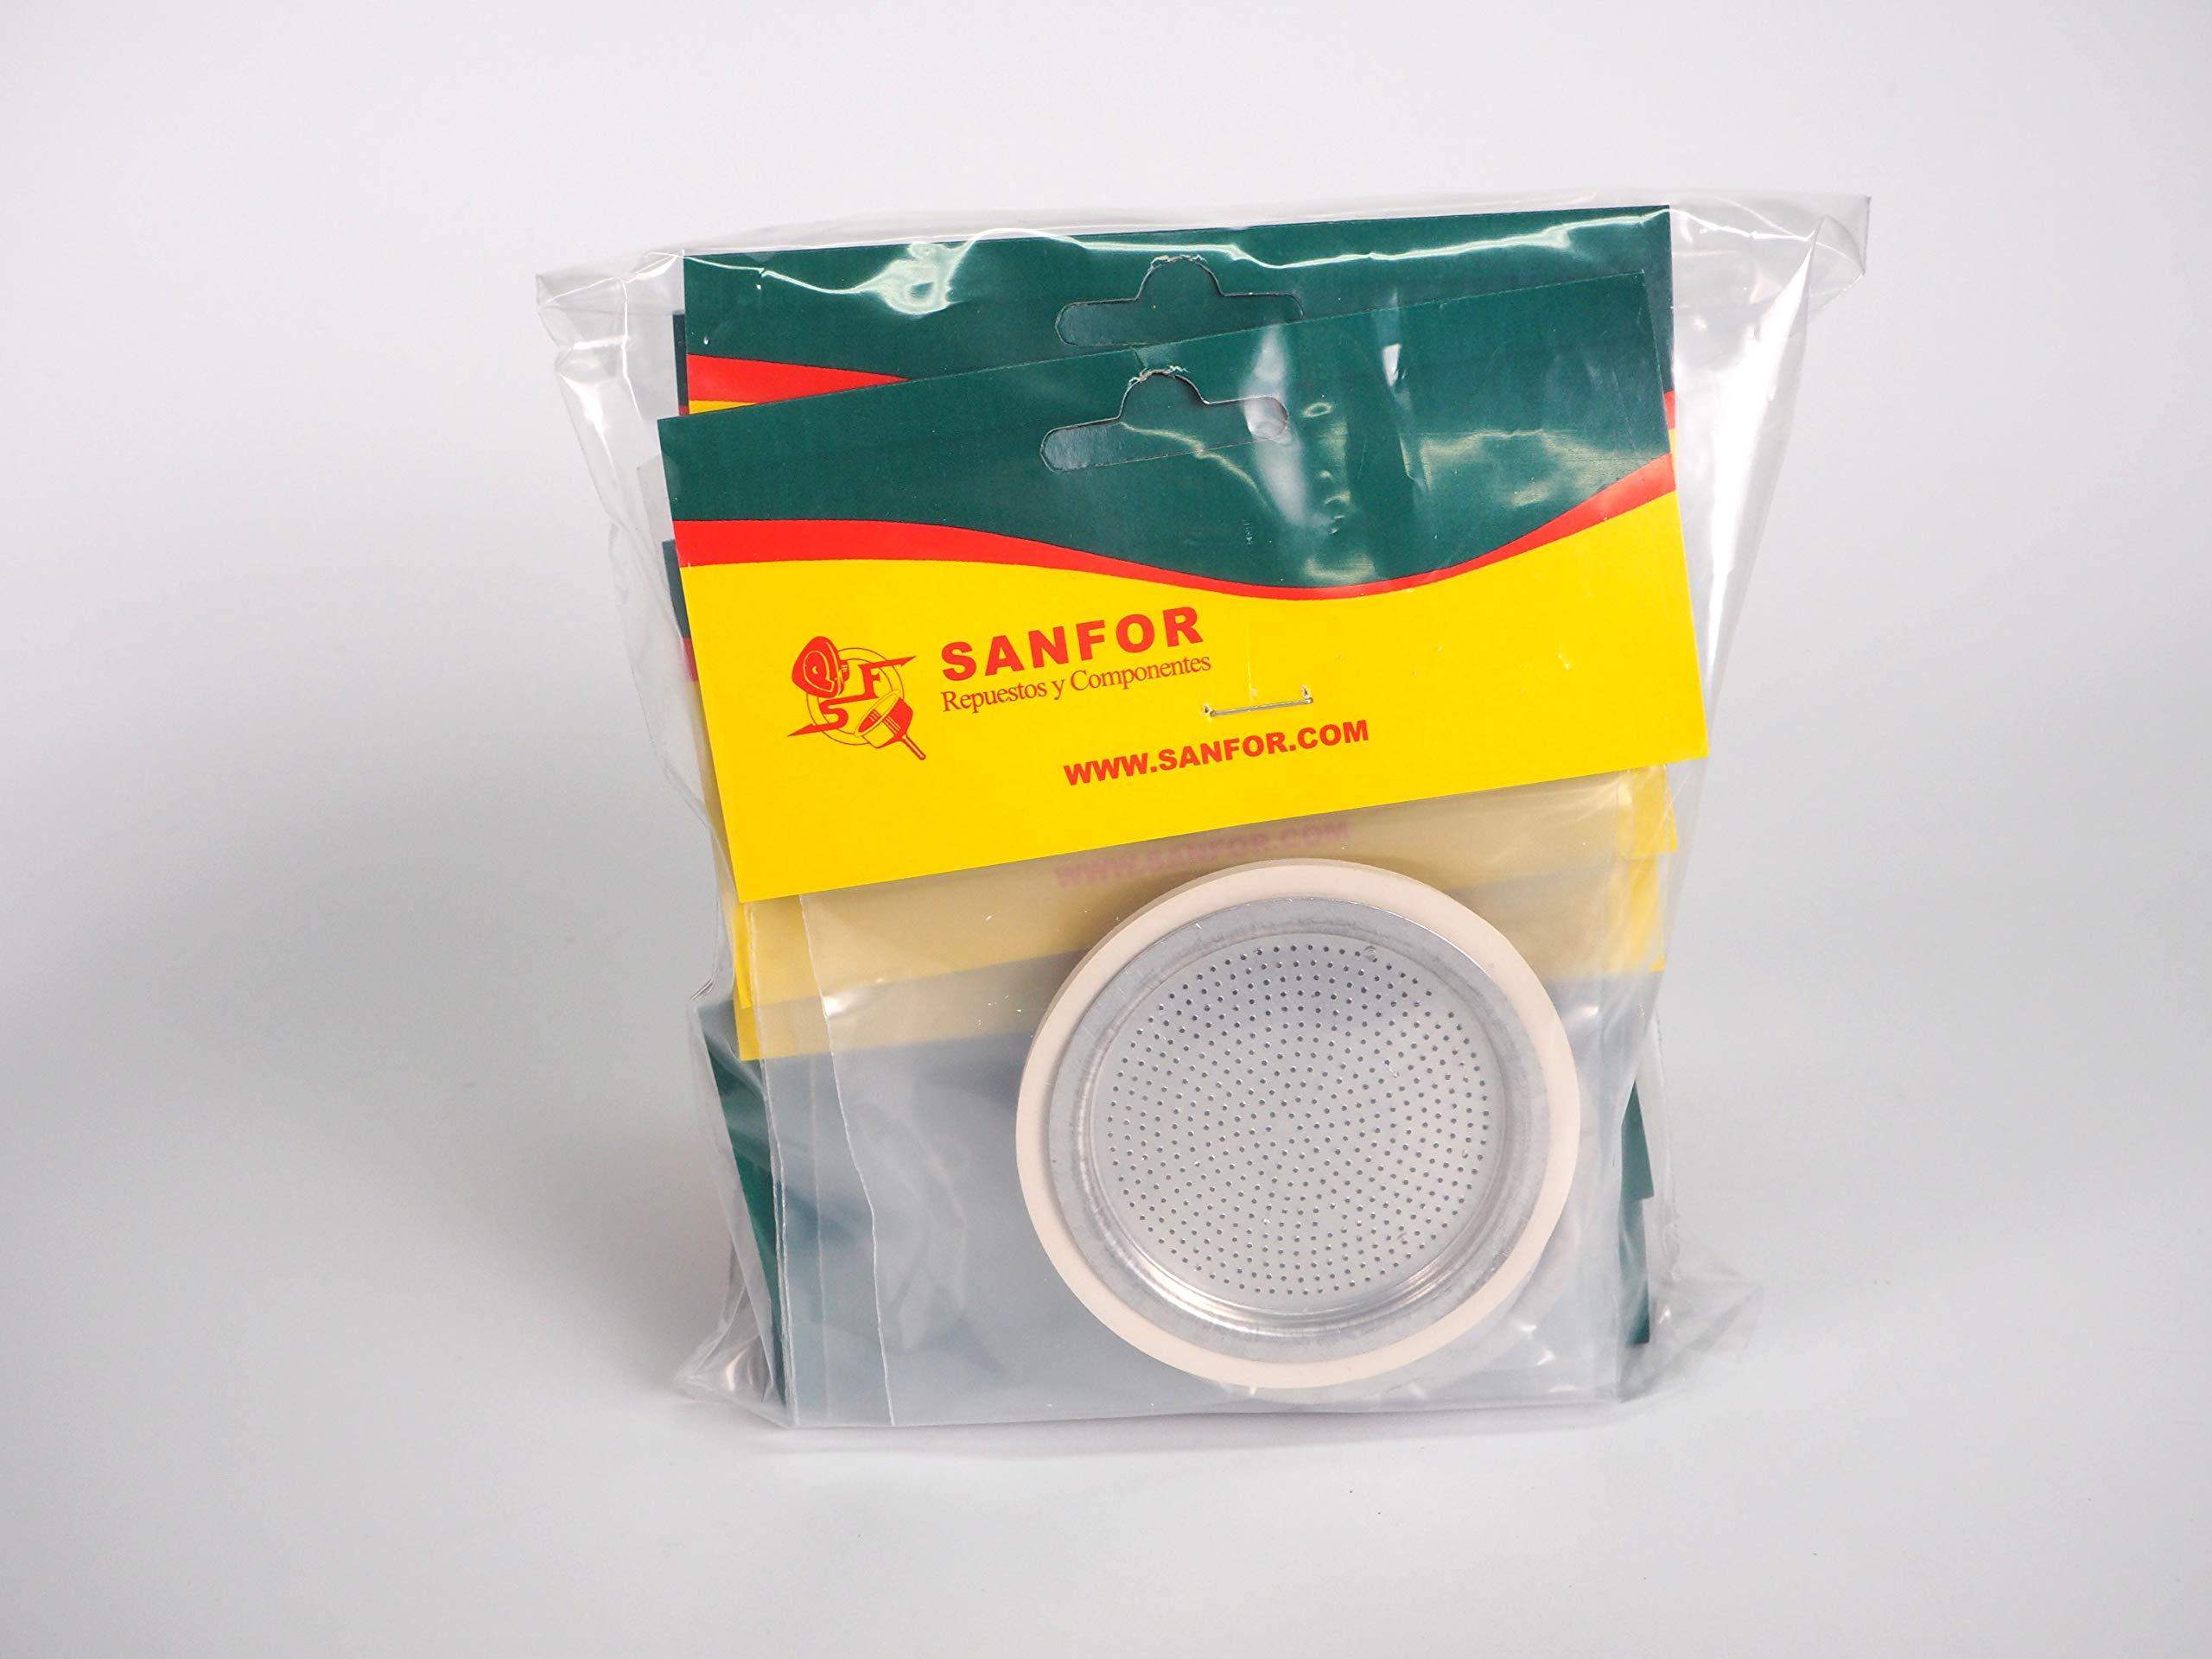 Sanfor 80256 Caja 100 Blíster Filtro+Junta Cafetera 6 Tazas ...